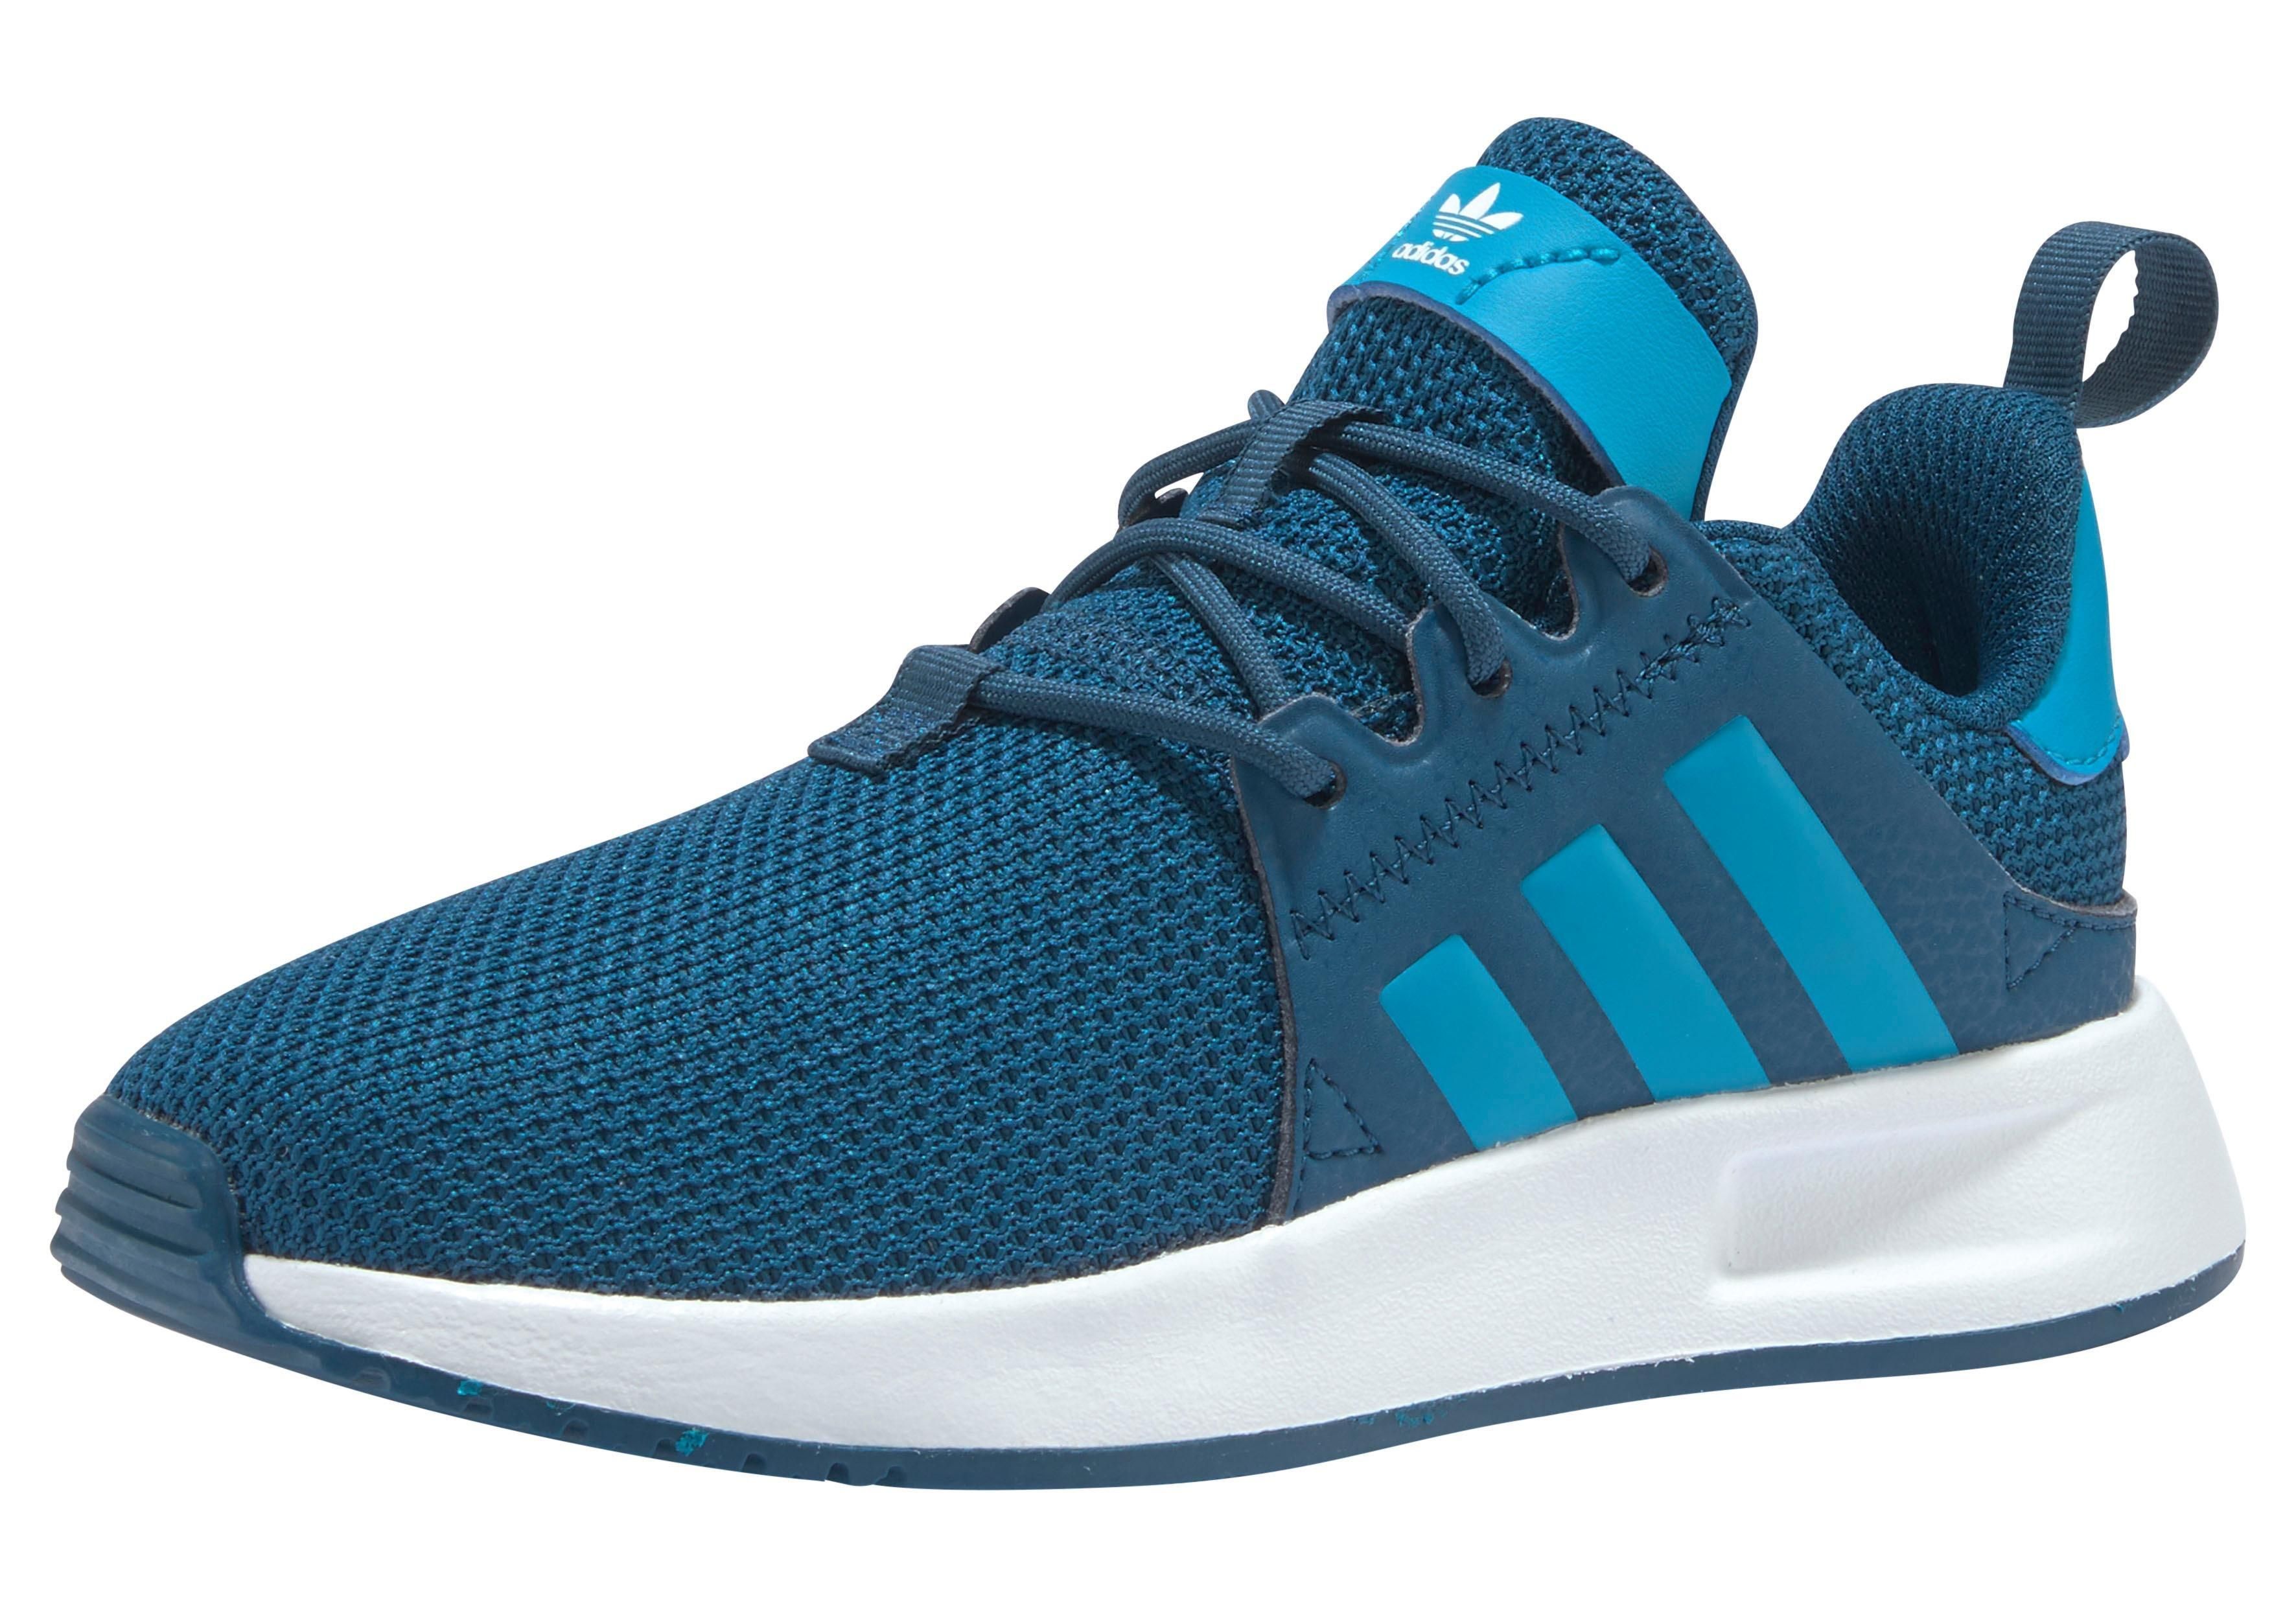 799b6dfa4 adidas Originals Tenisky »X_PLR J/C« námornícka modrá - Glami.sk